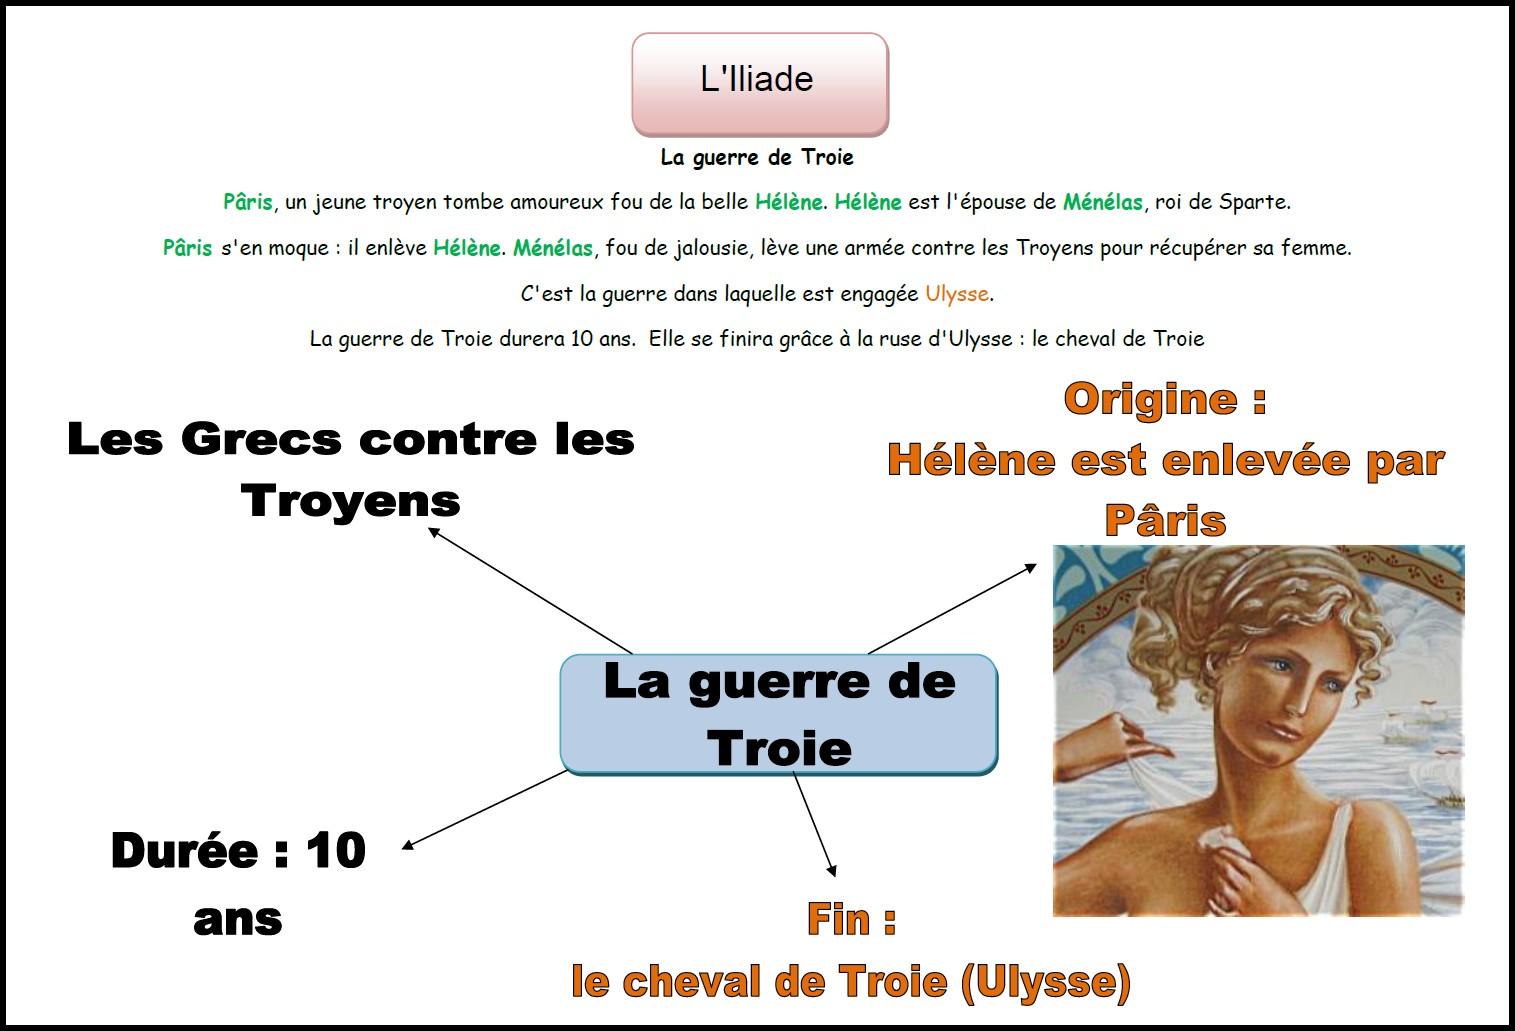 image carte mentale Iliade Guerre Troie